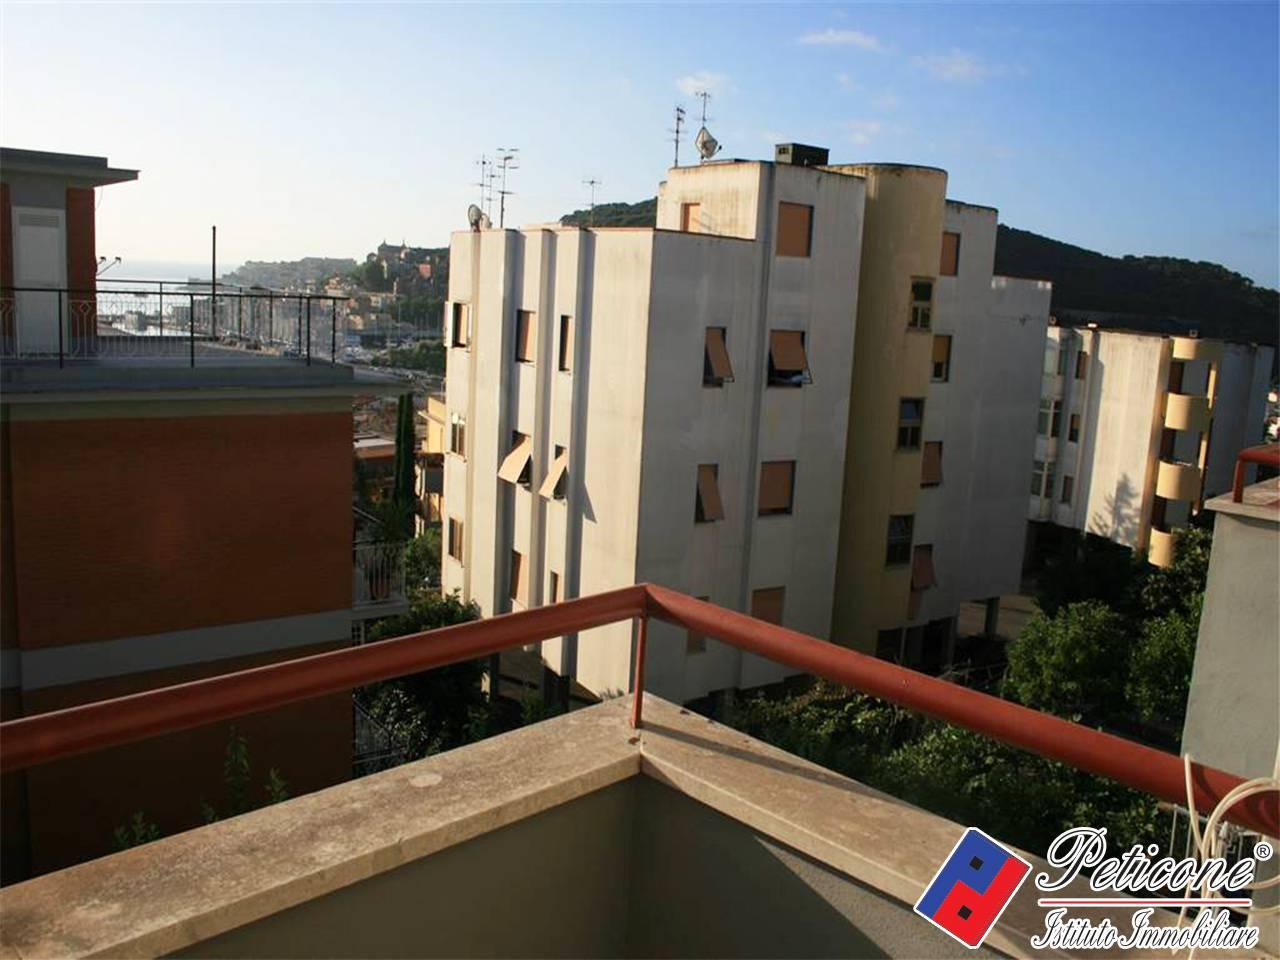 Appartamento in Vendita a Gaeta: 4 locali, 91 mq - Foto 9